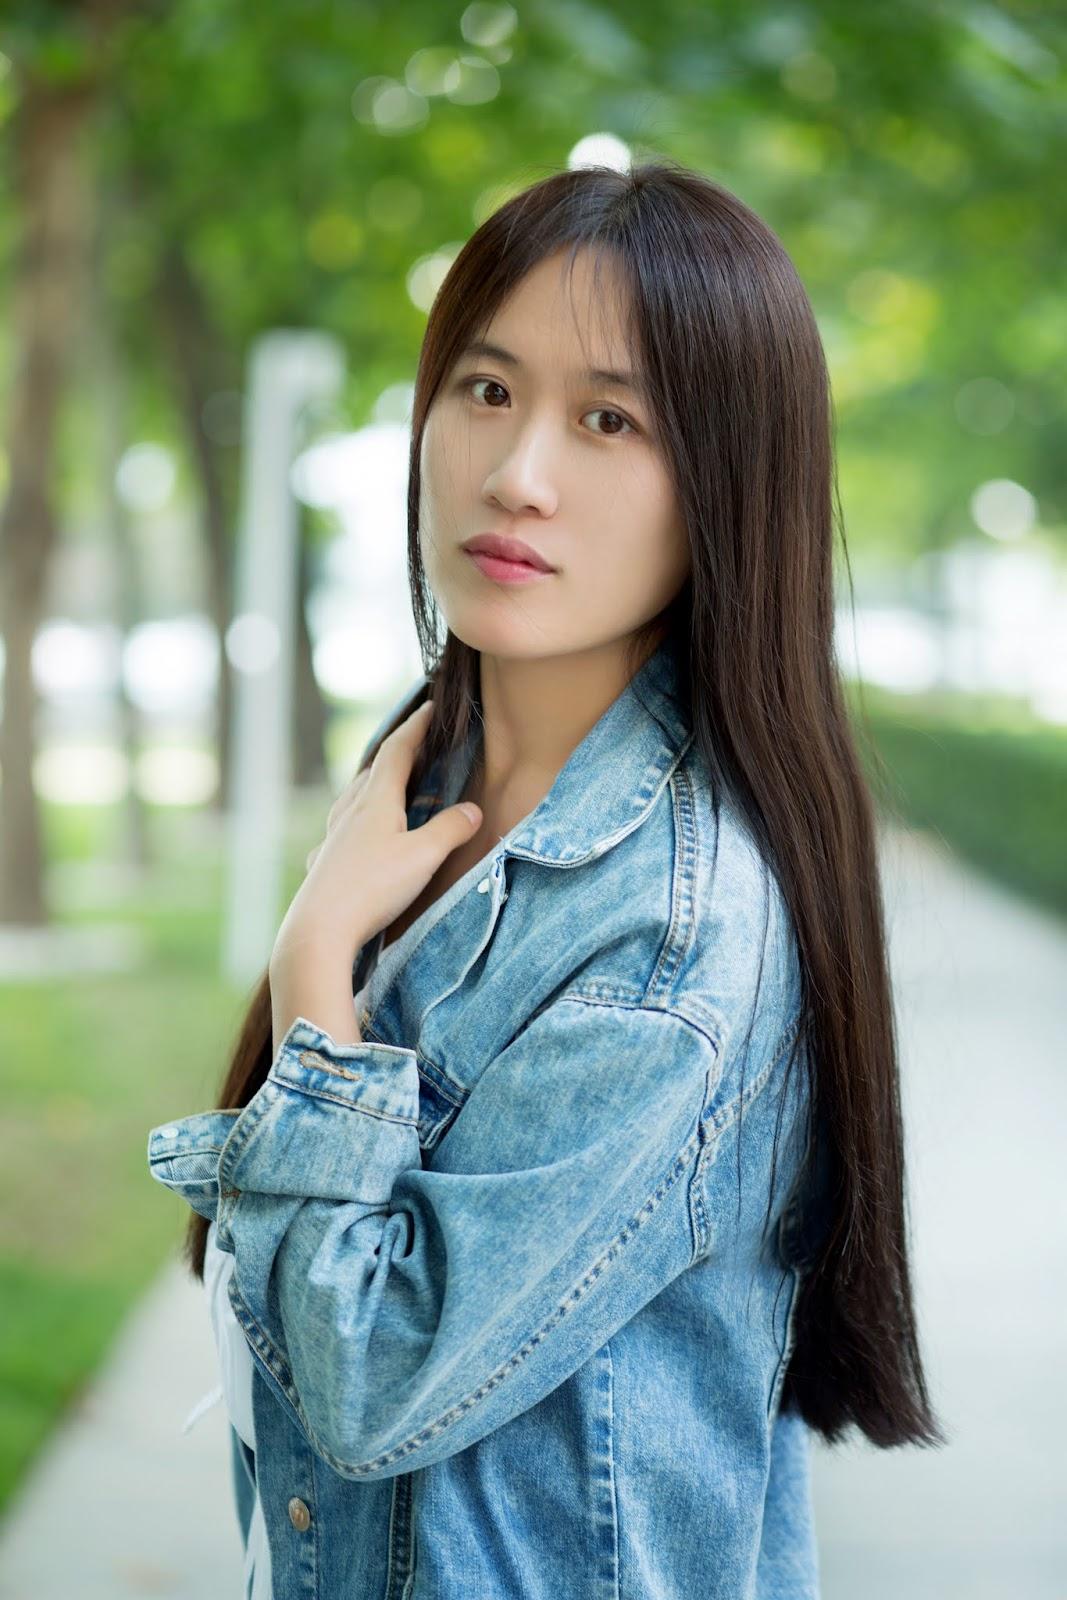 Jessica%2B%25289%2529 - TuiGirl No.60